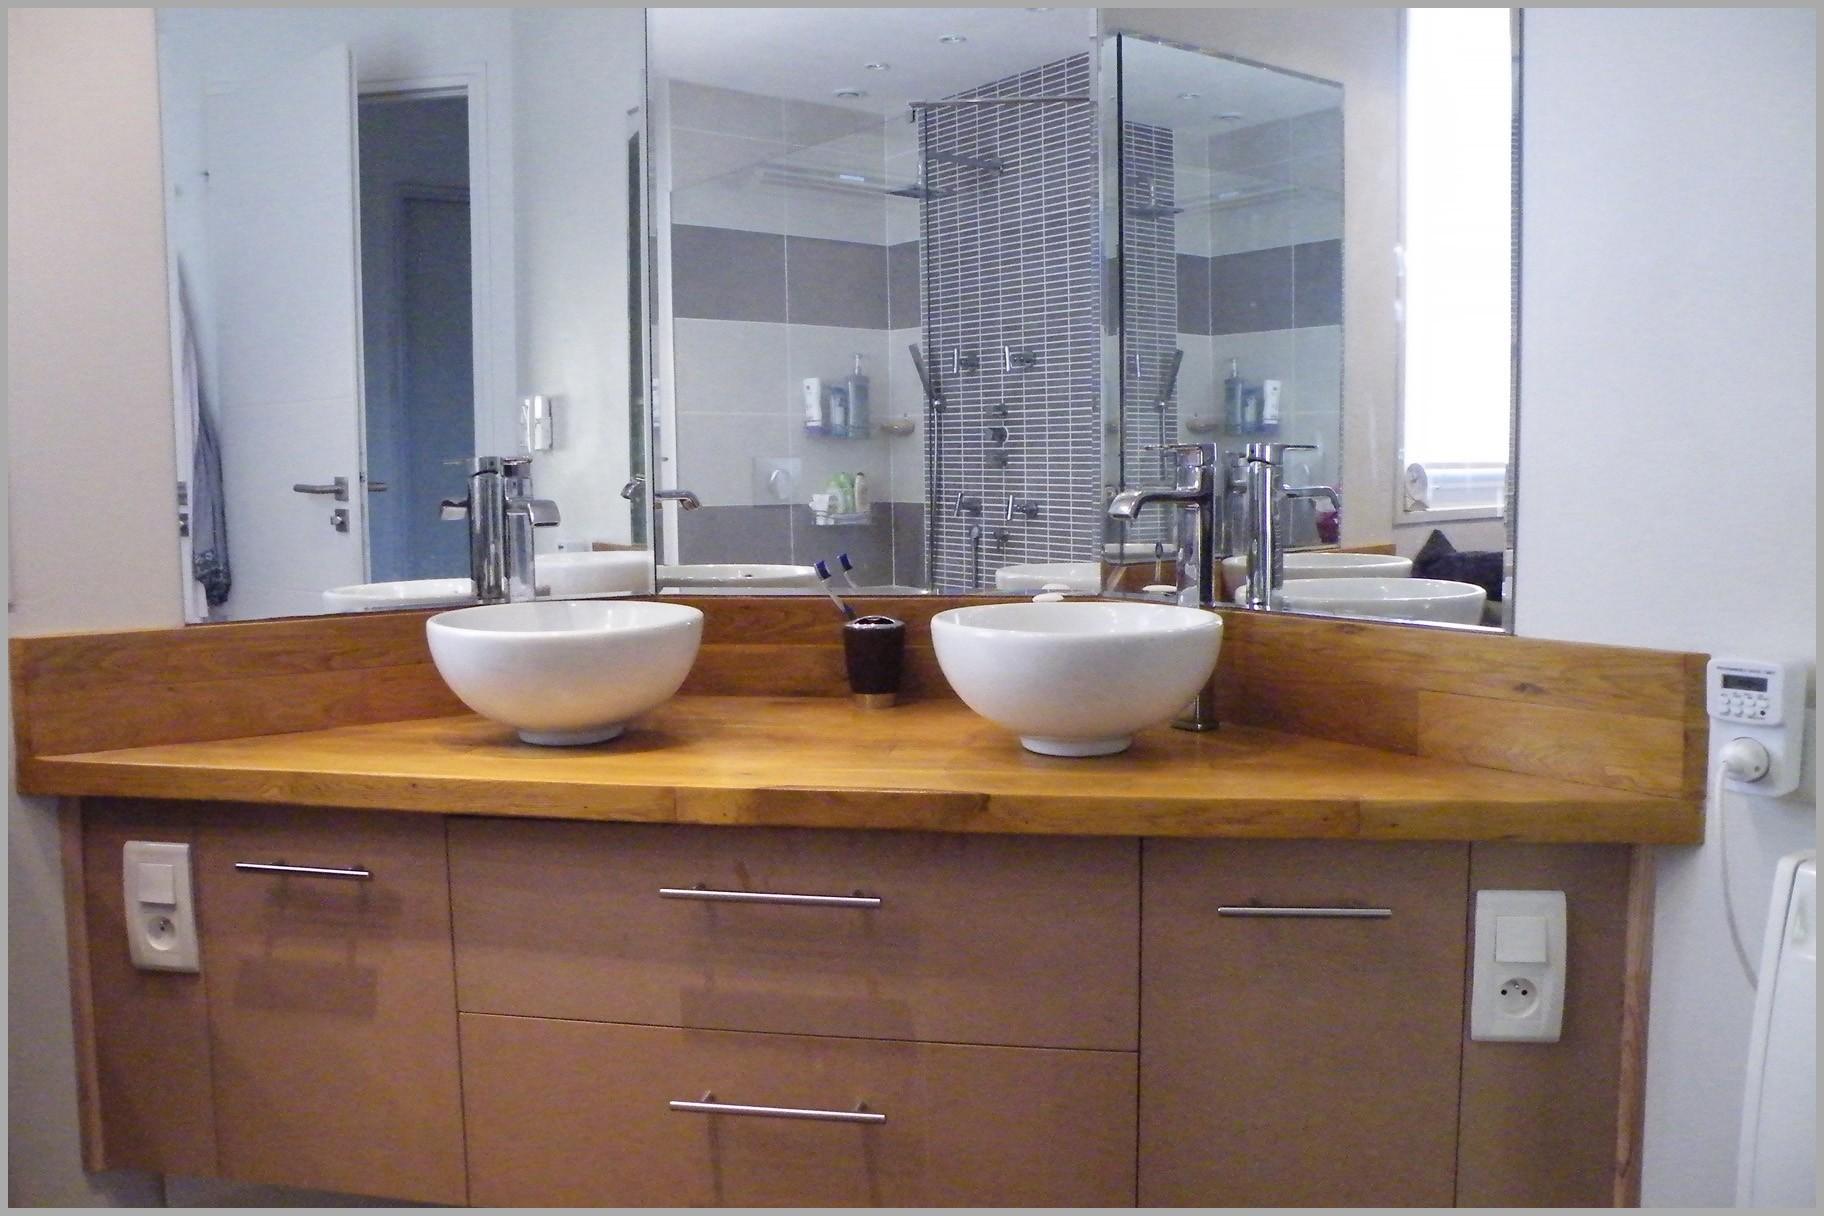 meuble d 39 angle salle de bain leroy merlin lille menage. Black Bedroom Furniture Sets. Home Design Ideas